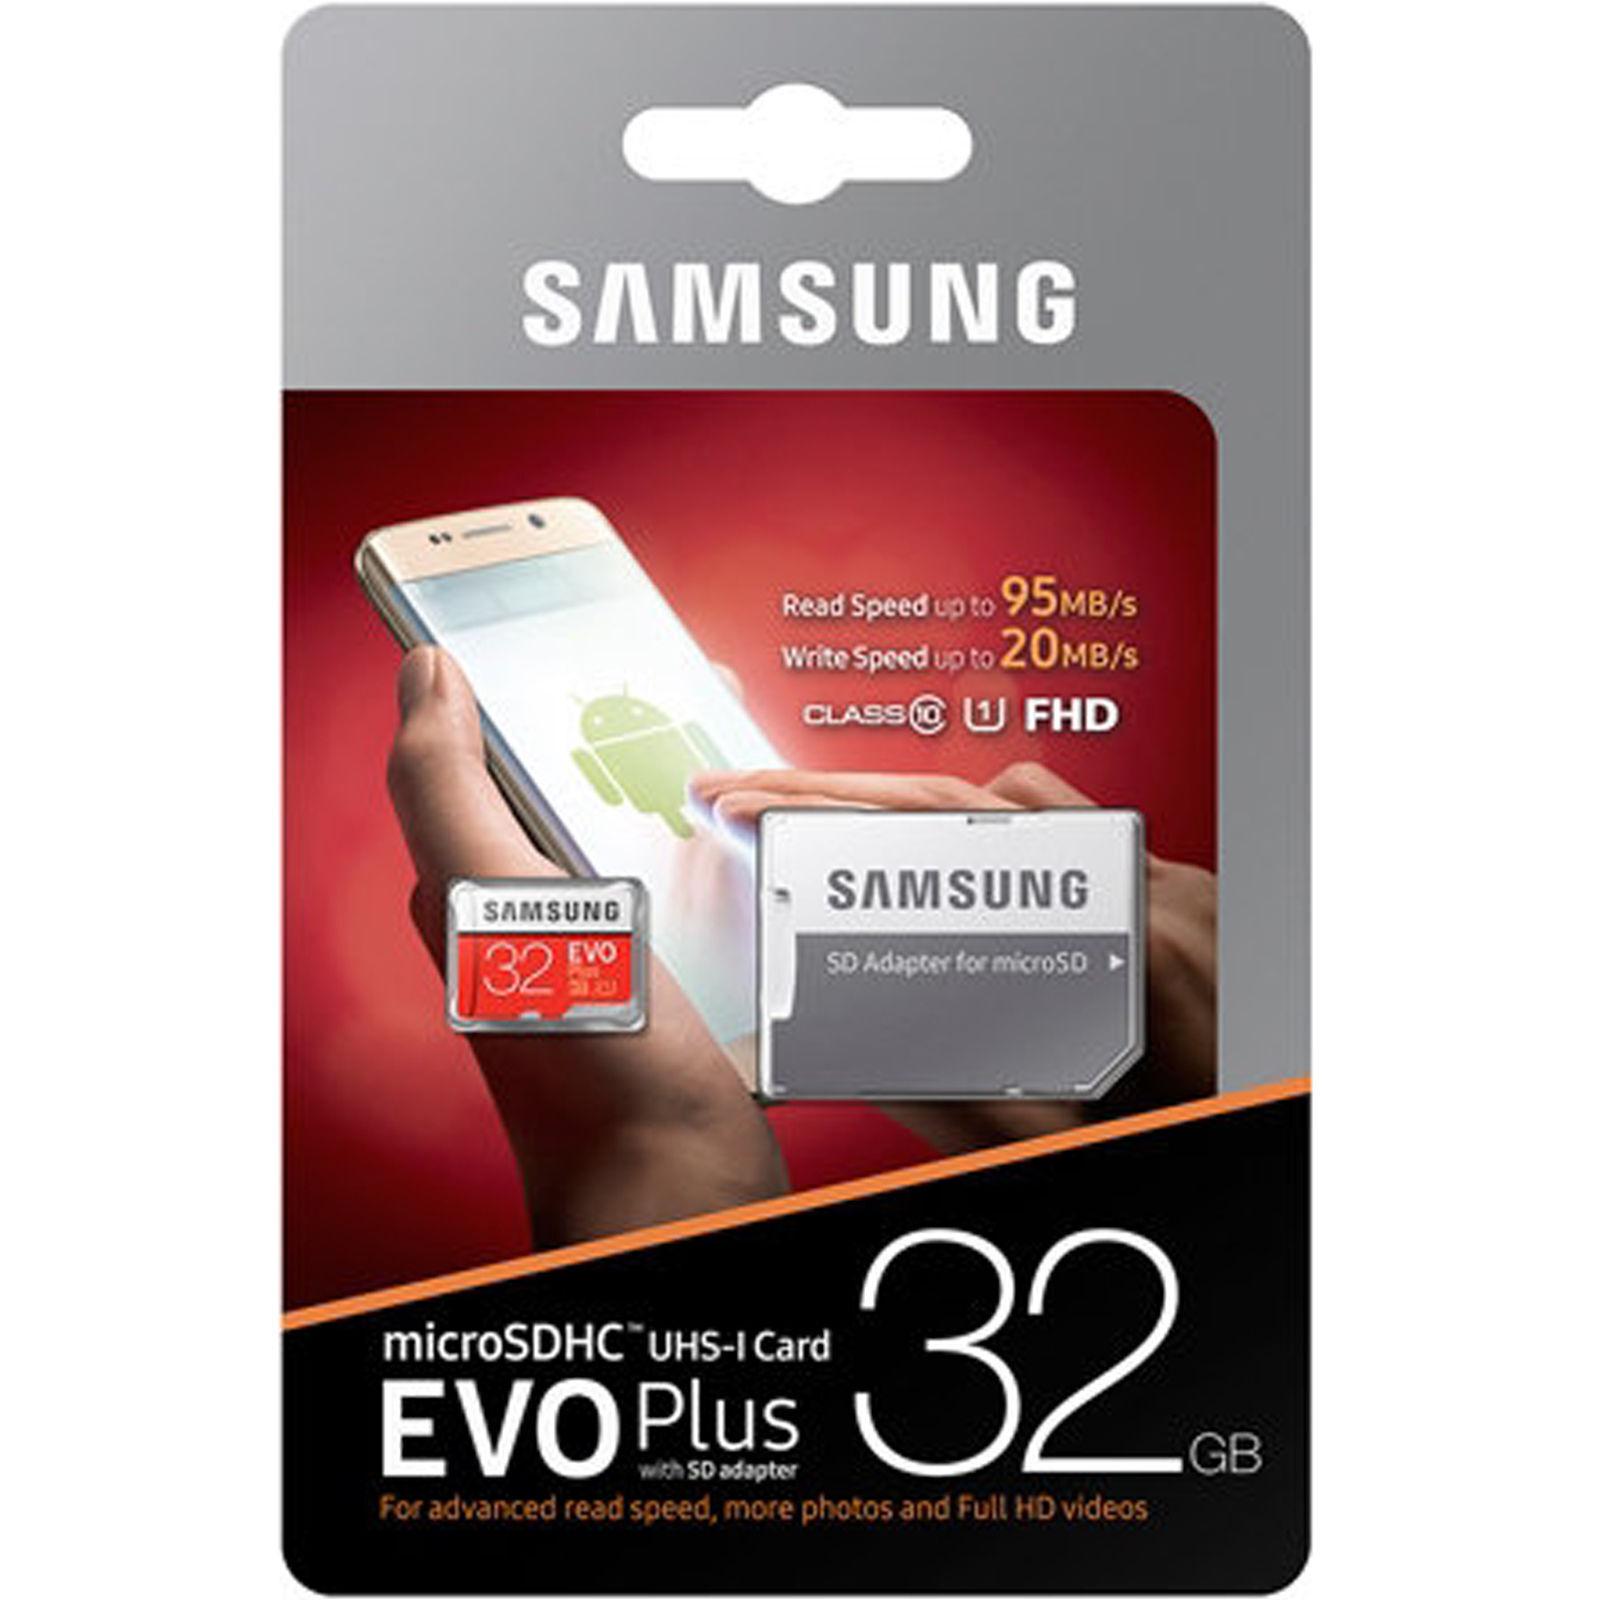 SAMSUNG EVO Plus 32GB MicroSD Micro SDHC C10 Flash Memory Ca